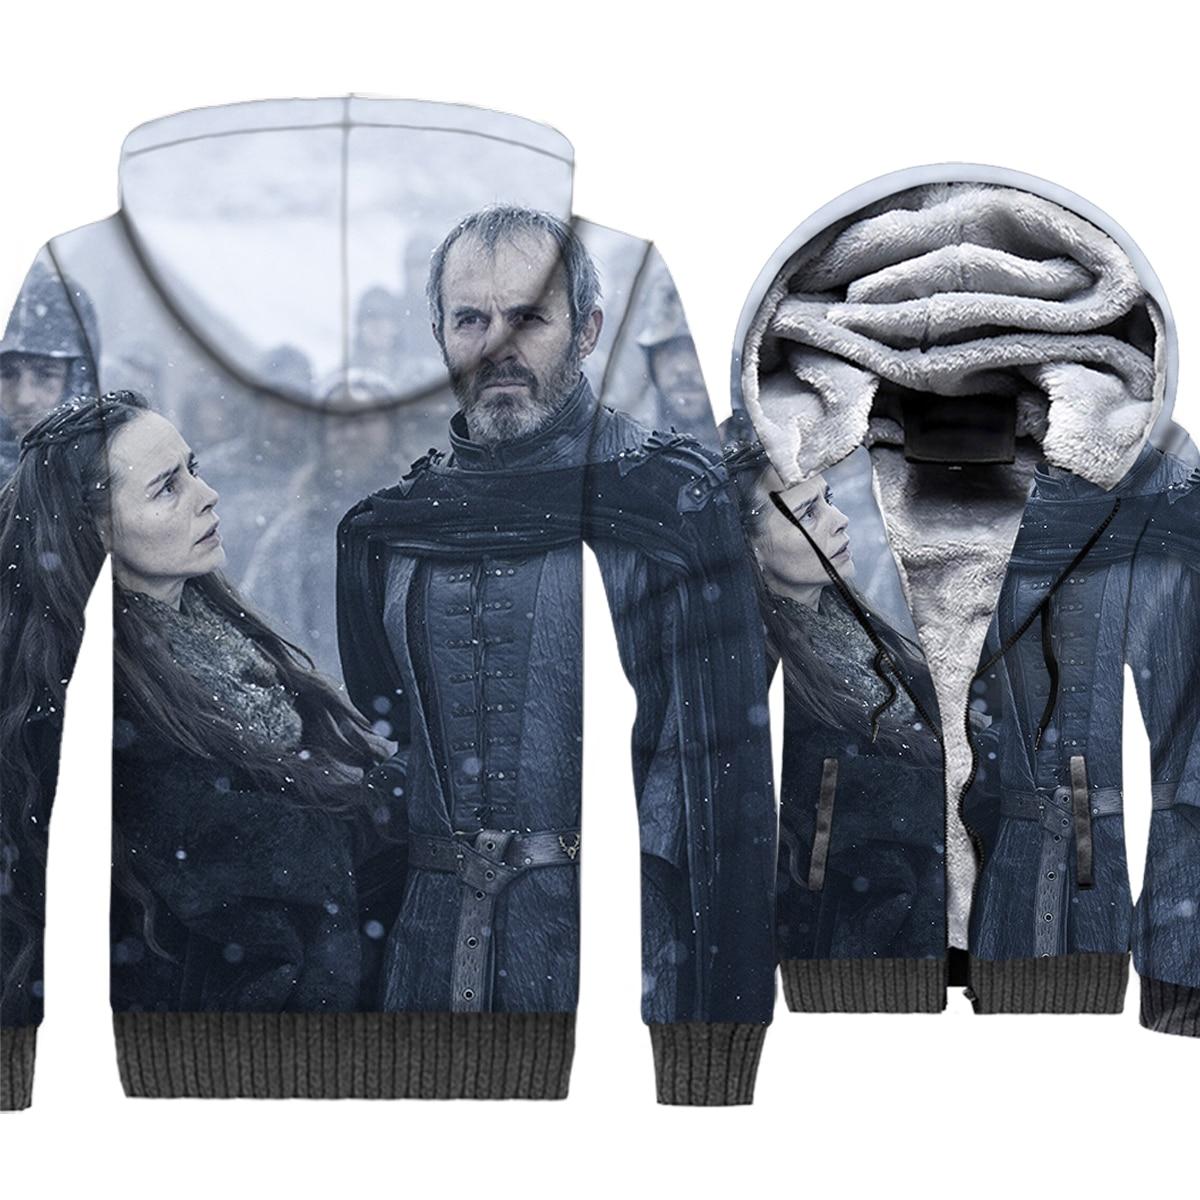 Game of Thrones 3D Print Hoodie Men Dragon Hooded Sweatshirt Winter Thick Fleece Warm Zip up Coat Hipster Jacket Brand Clothing in Hoodies amp Sweatshirts from Men 39 s Clothing